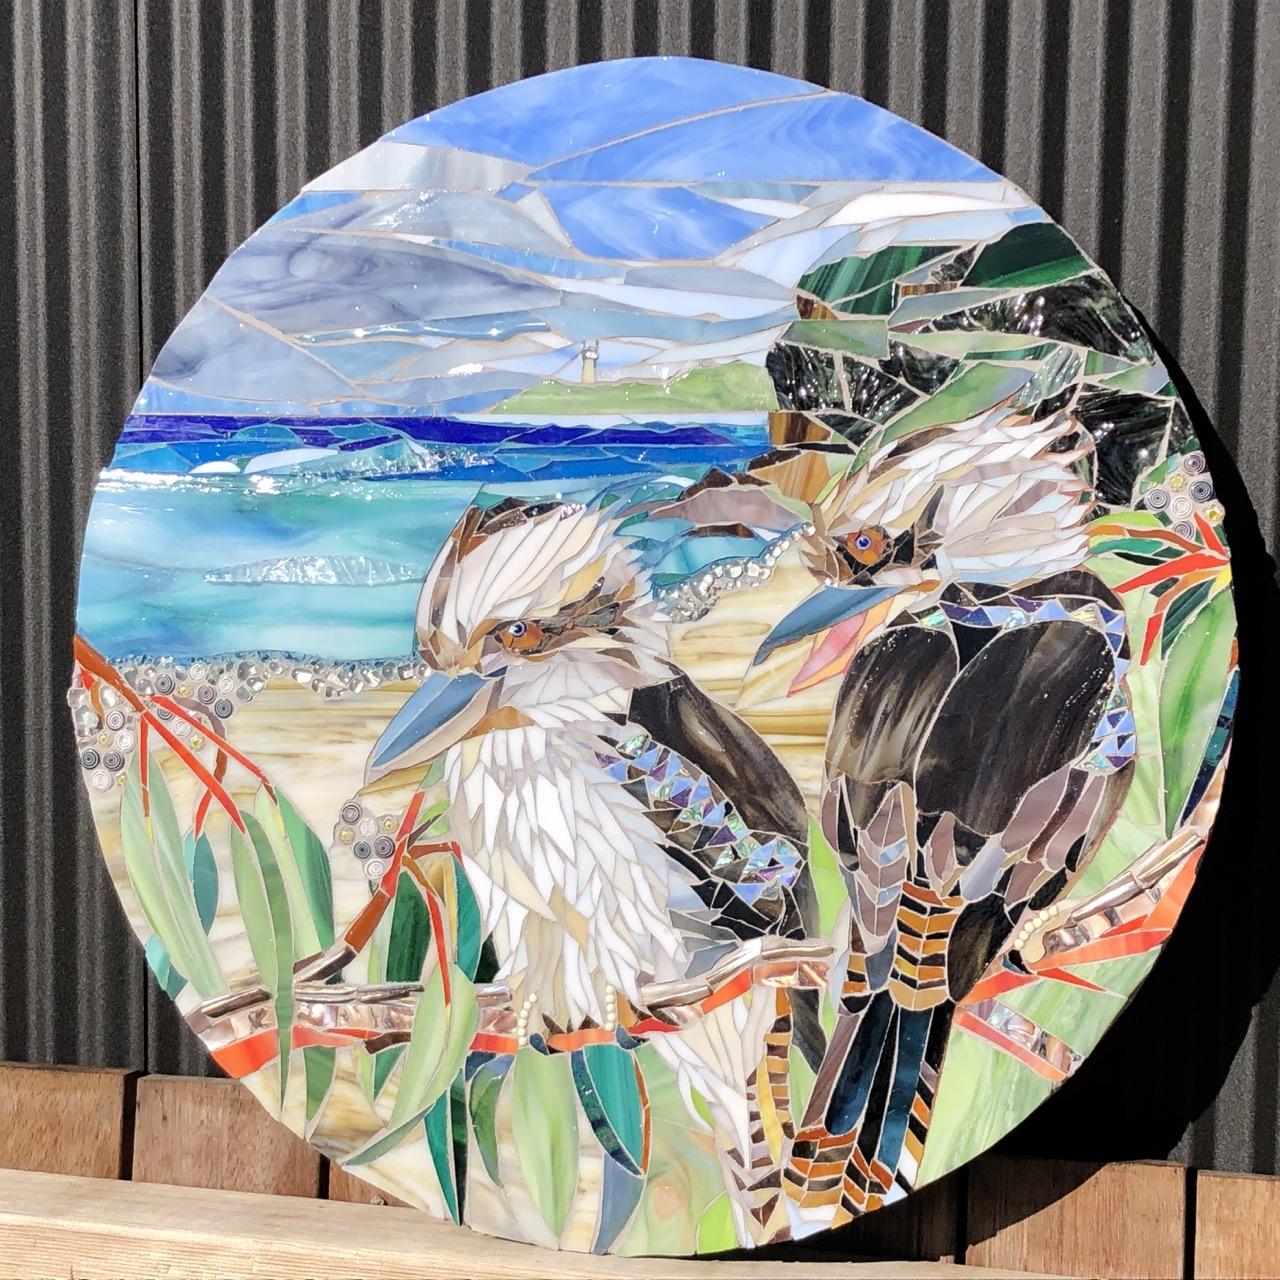 kookaburra_mosaic.jpg